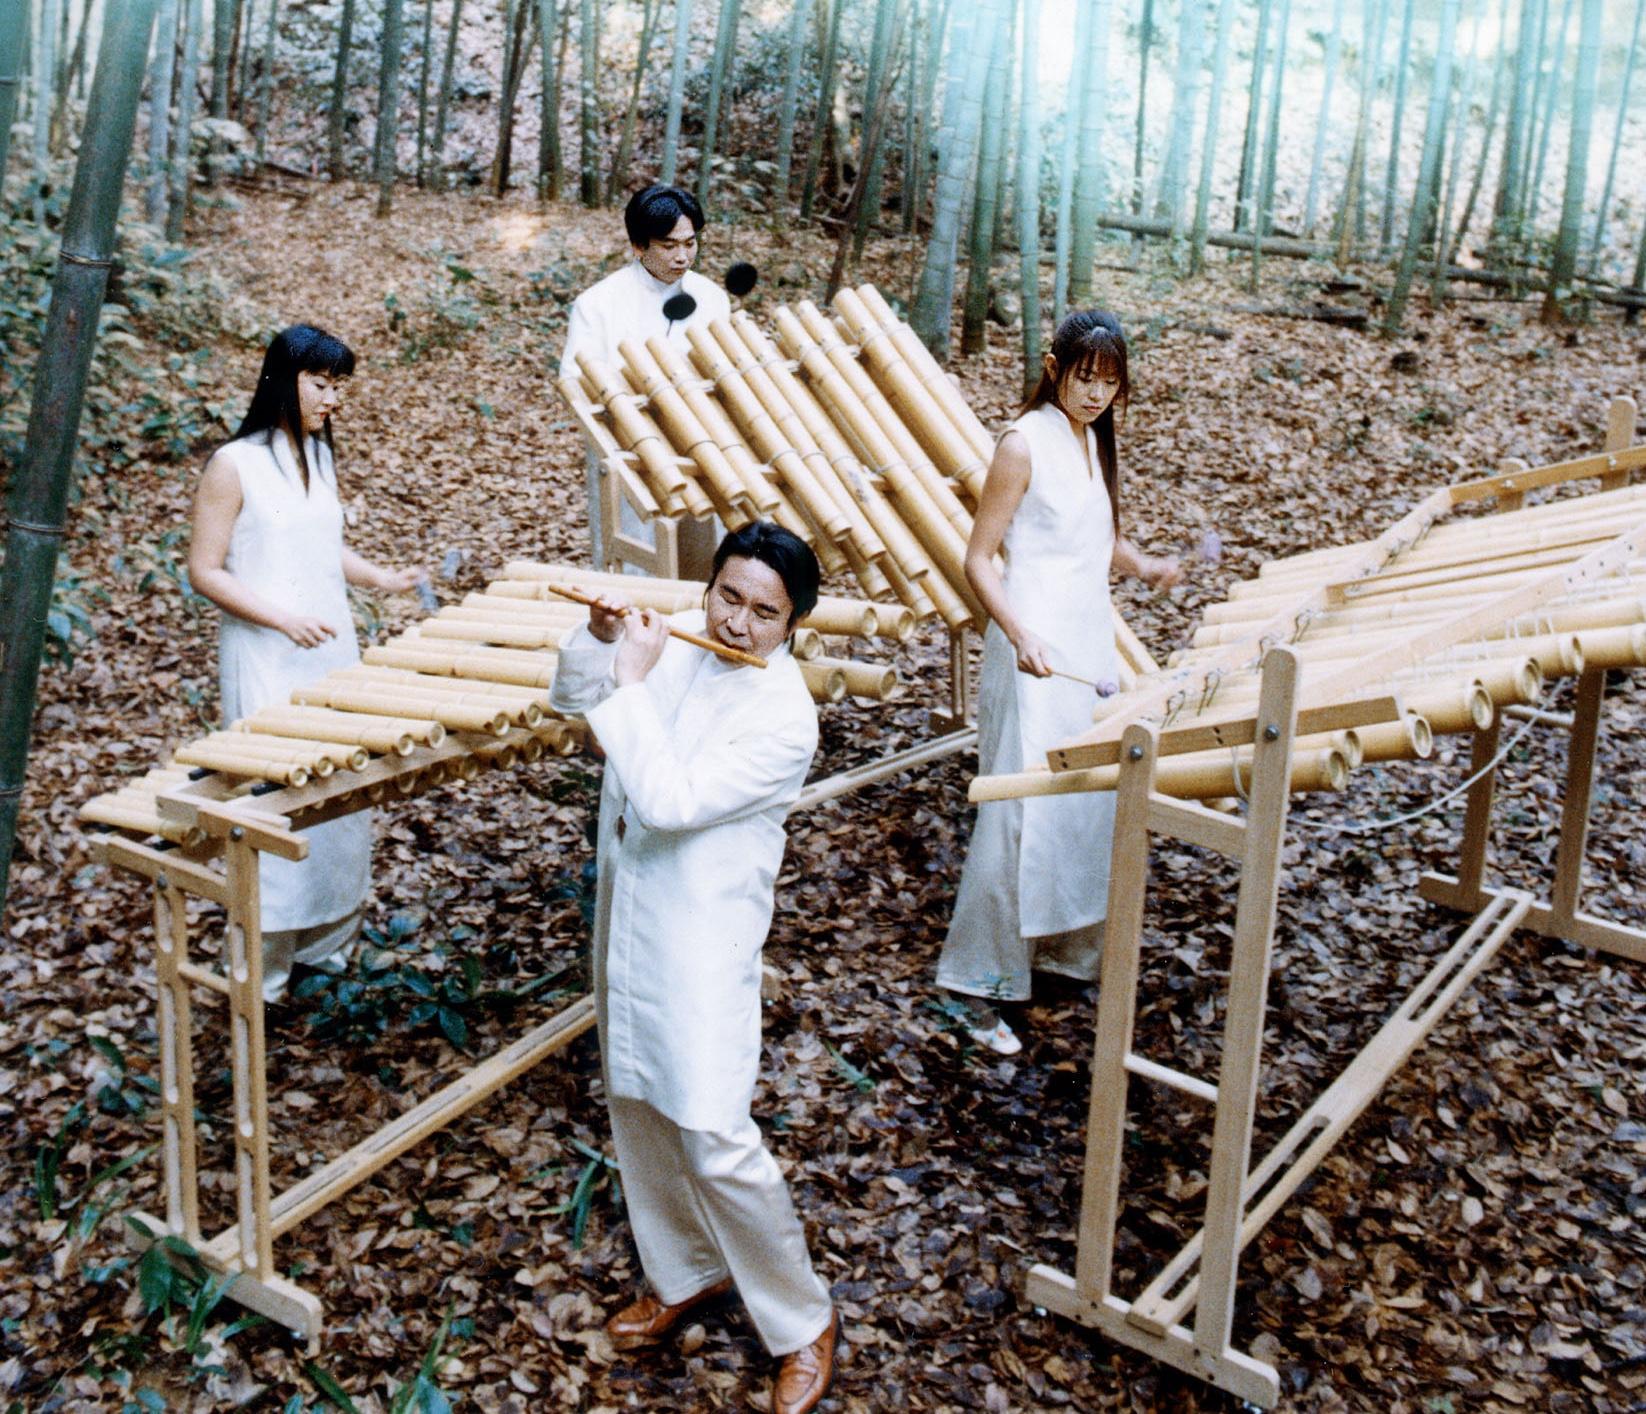 OZAN&バンブーシンフォニア 日本×アジア×竹の楽器